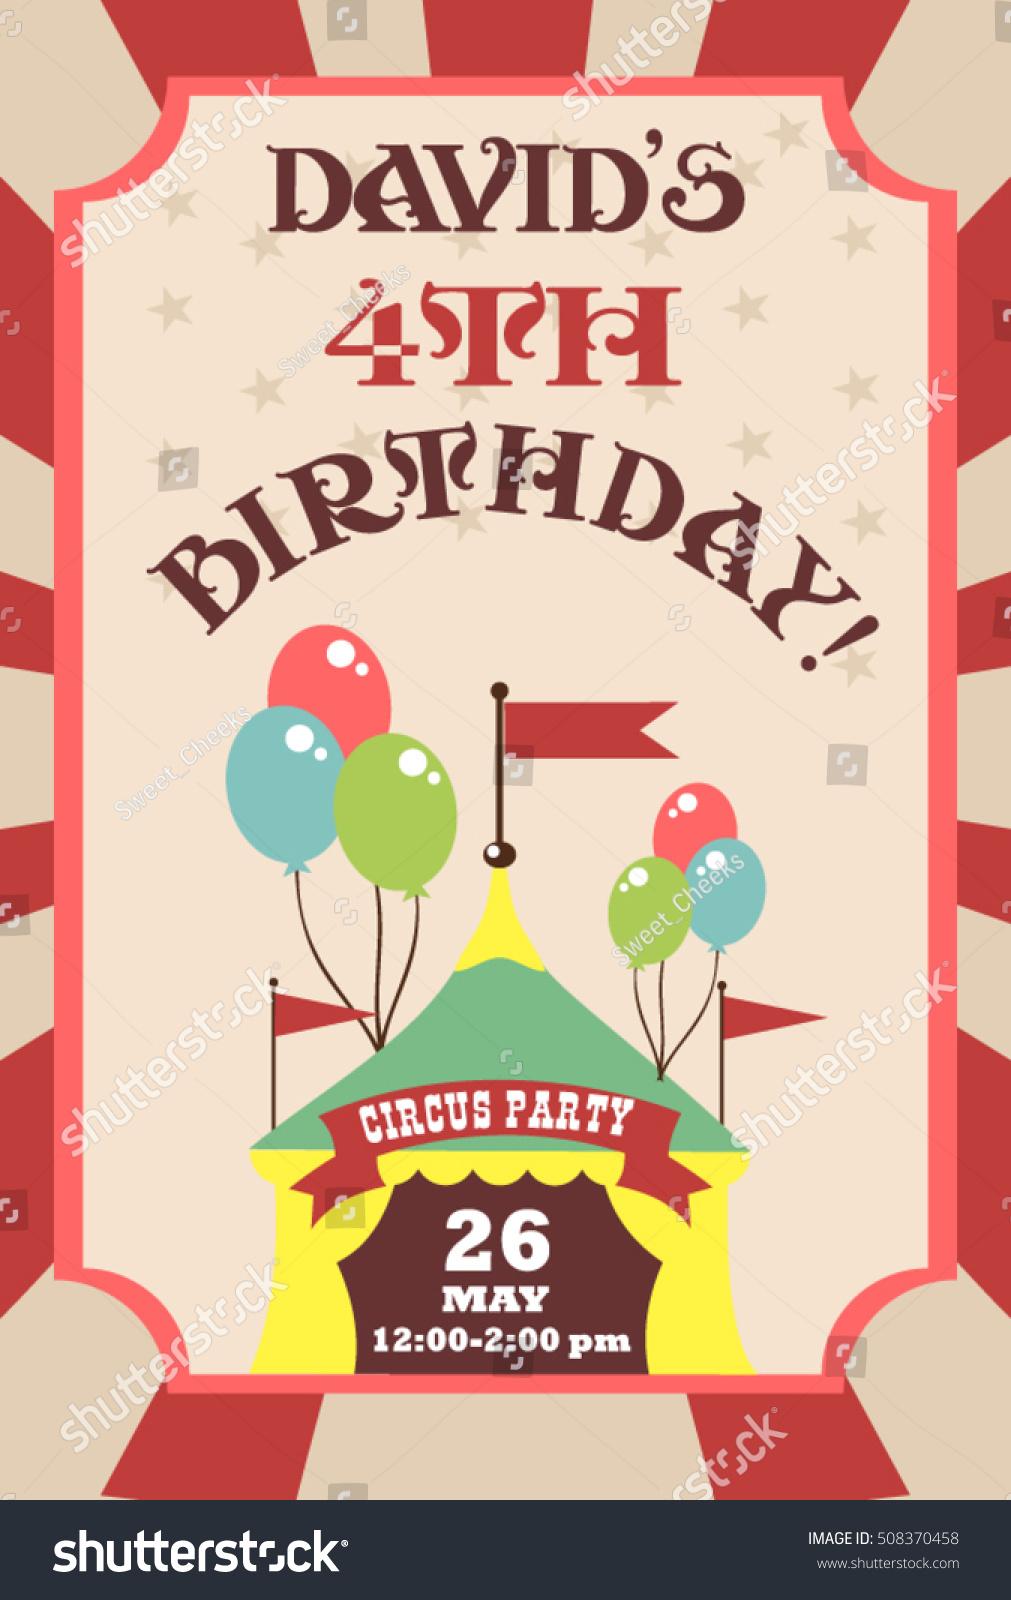 Circus Birthday Invitation Card Stock Vector 508370458 - Shutterstock